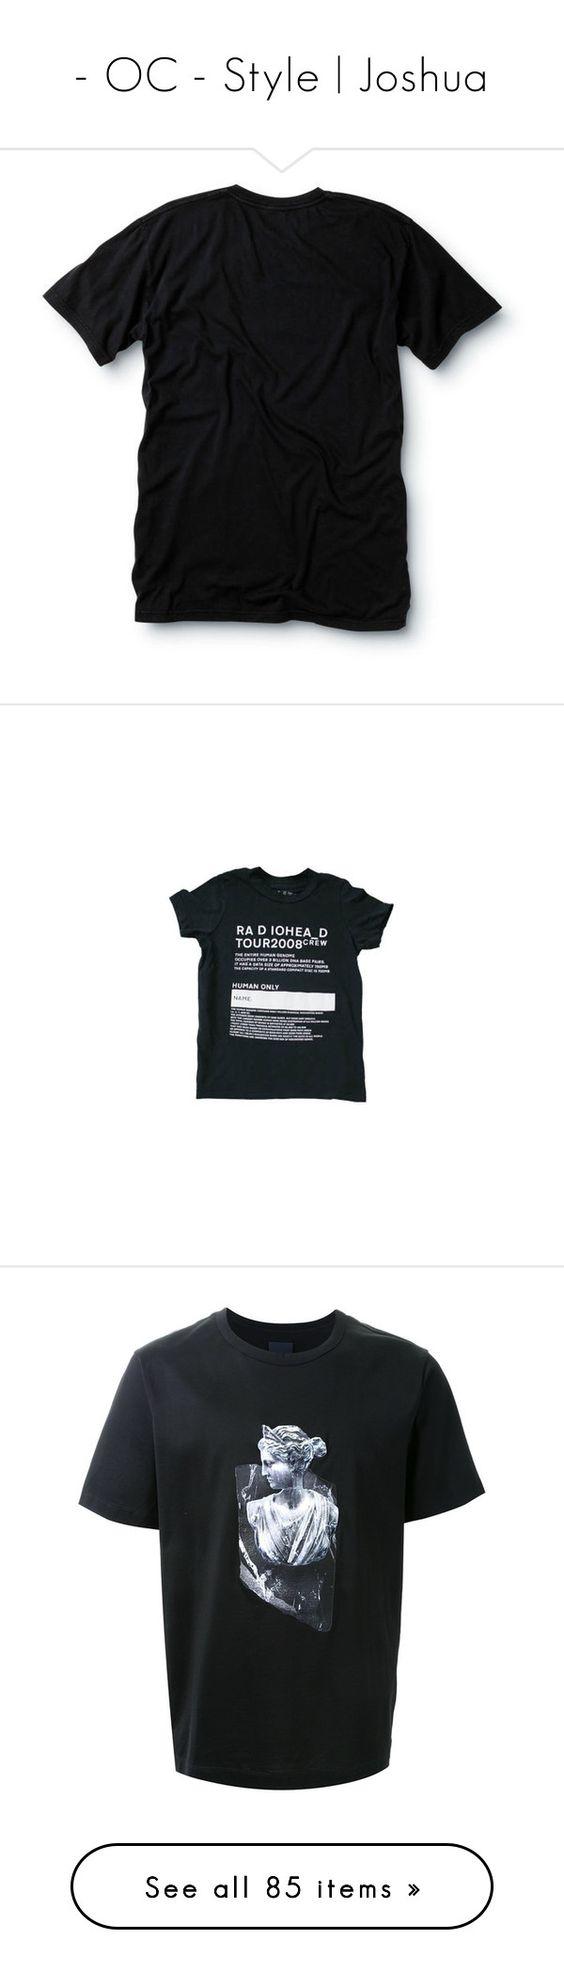 - OC - Style   Joshua by ashleeritson on Polyvore featuring polyvore, women's fashion, clothing, tops, t-shirts, shirts, quiksilver, t shirts, quiksilver shirt, dark t shirts, quiksilver t shirts, tees, grey tee, print t shirts, print tees, grey top, pattern tops, crew shirt, crew neck tee, crew t shirt, crew neck top, summer shirts, dresses, black, tee dress, oversized t shirt dress, t shirt dress, short sleeve t-shirt dress, sweater dress, omocat, cotton tee, unisex tops, cotton t shirt…